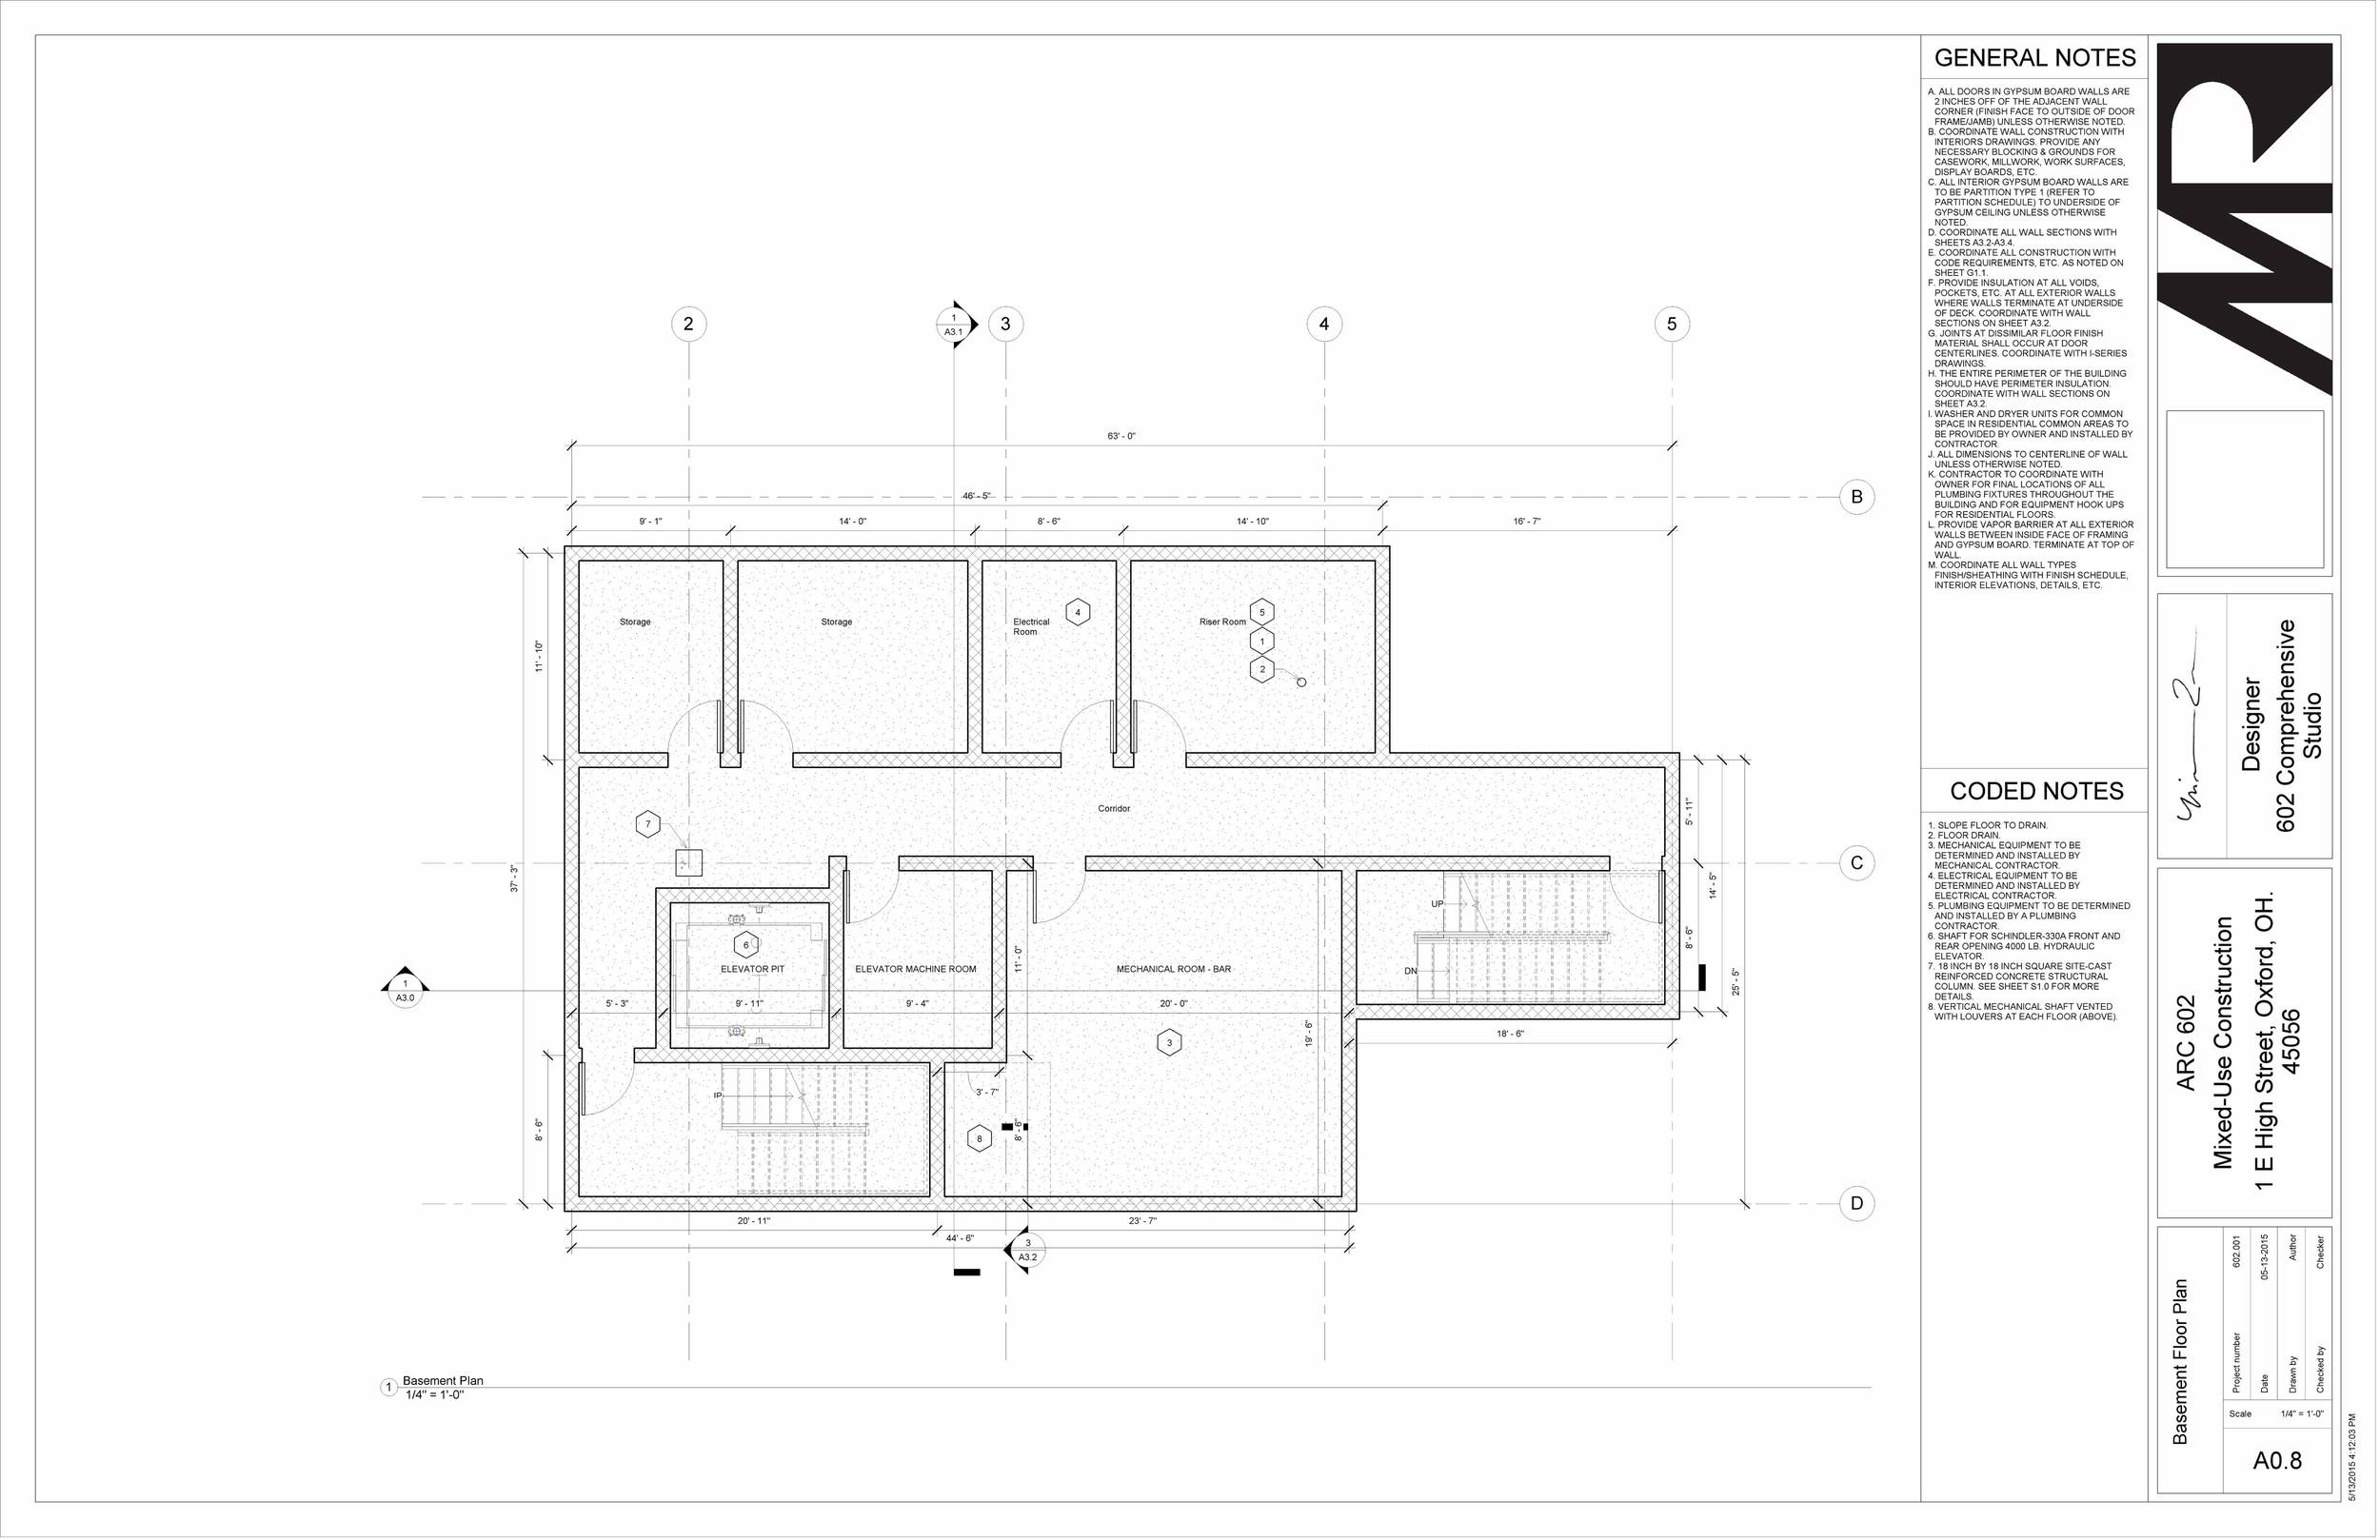 602 Studio - Sheet - A0-8 - Basement Floor Plan copy.jpg